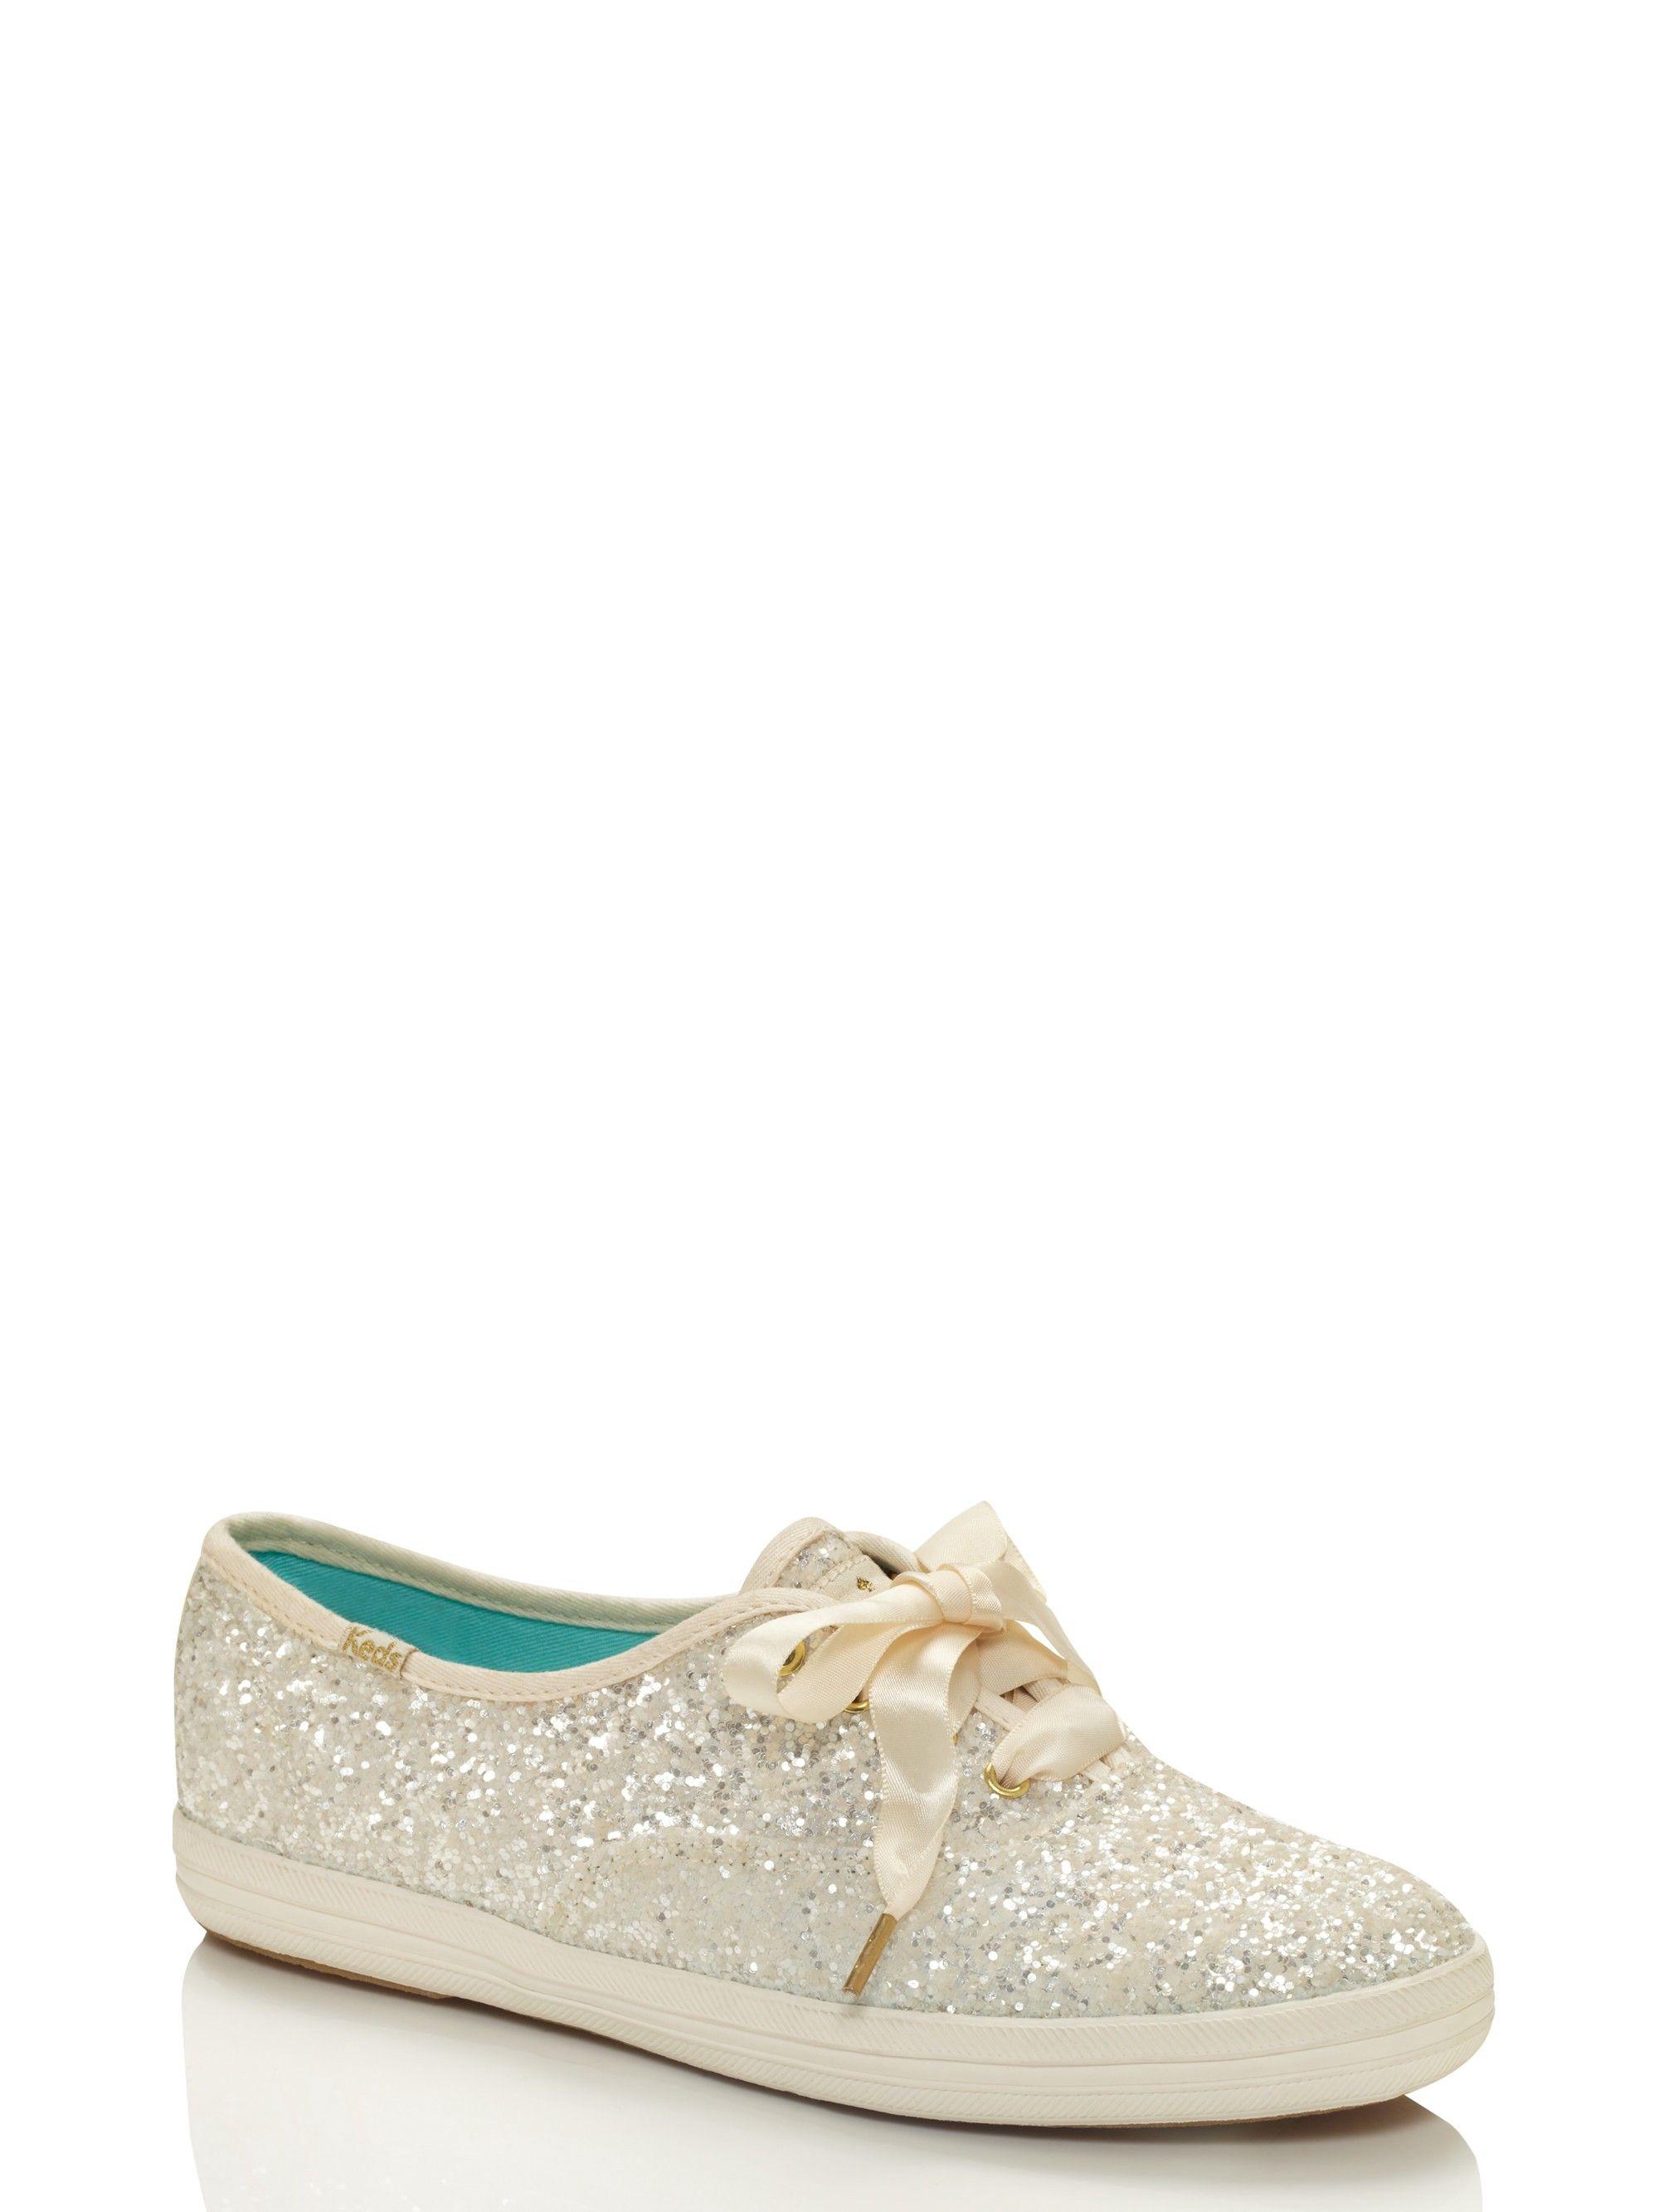 89464e3e88c4 KATE SPADE Keds For Kate Spade New York Glitter Sneakers.  katespade  shoes   all